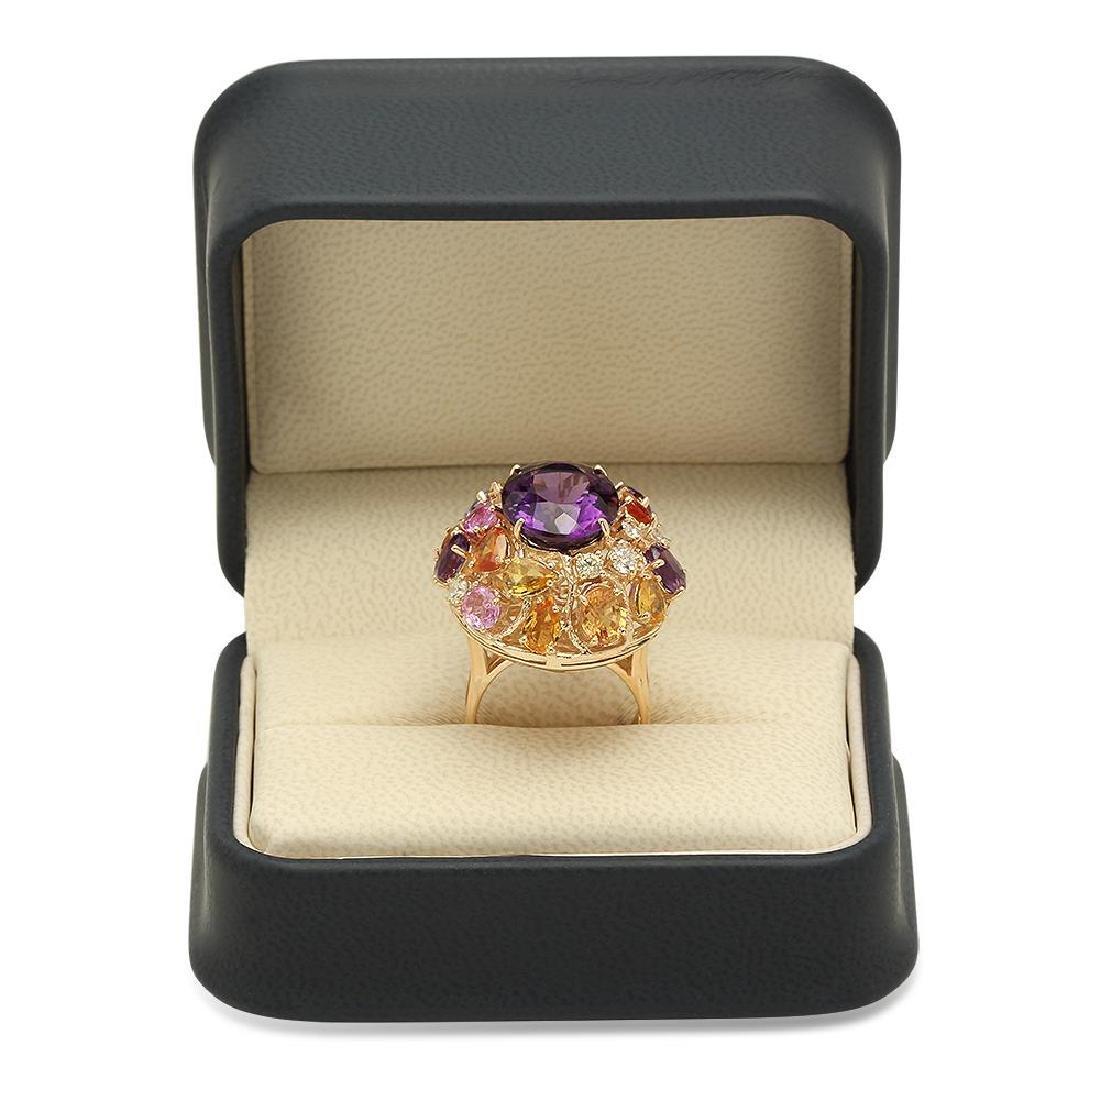 14K Gold 8.26ct Amethyst 6.46ct Sapphire 0.7cts Diamond - 4